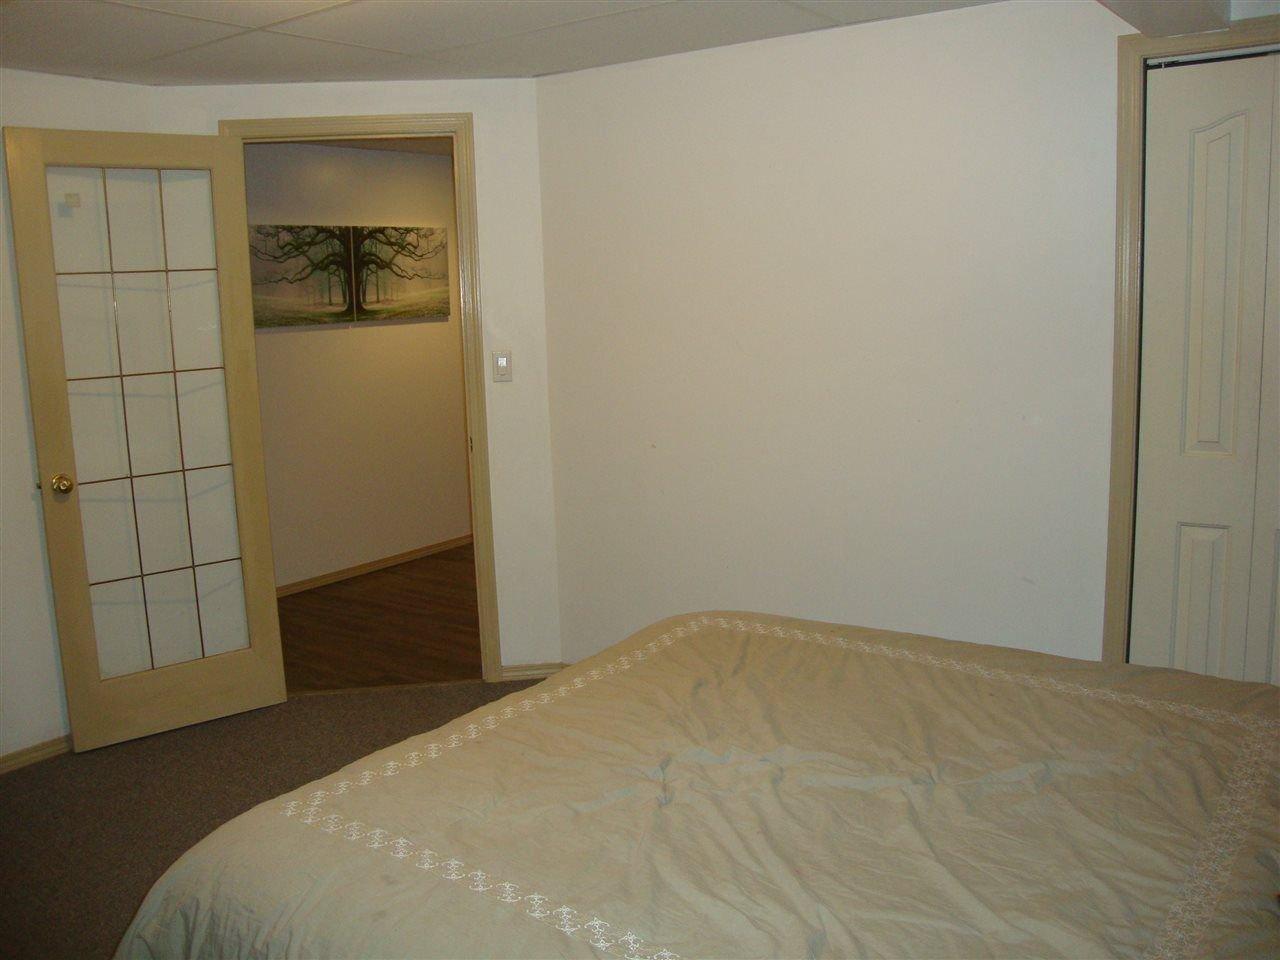 Photo 26: Photos: 4711 51A Avenue: Bon Accord House for sale : MLS®# E4149195